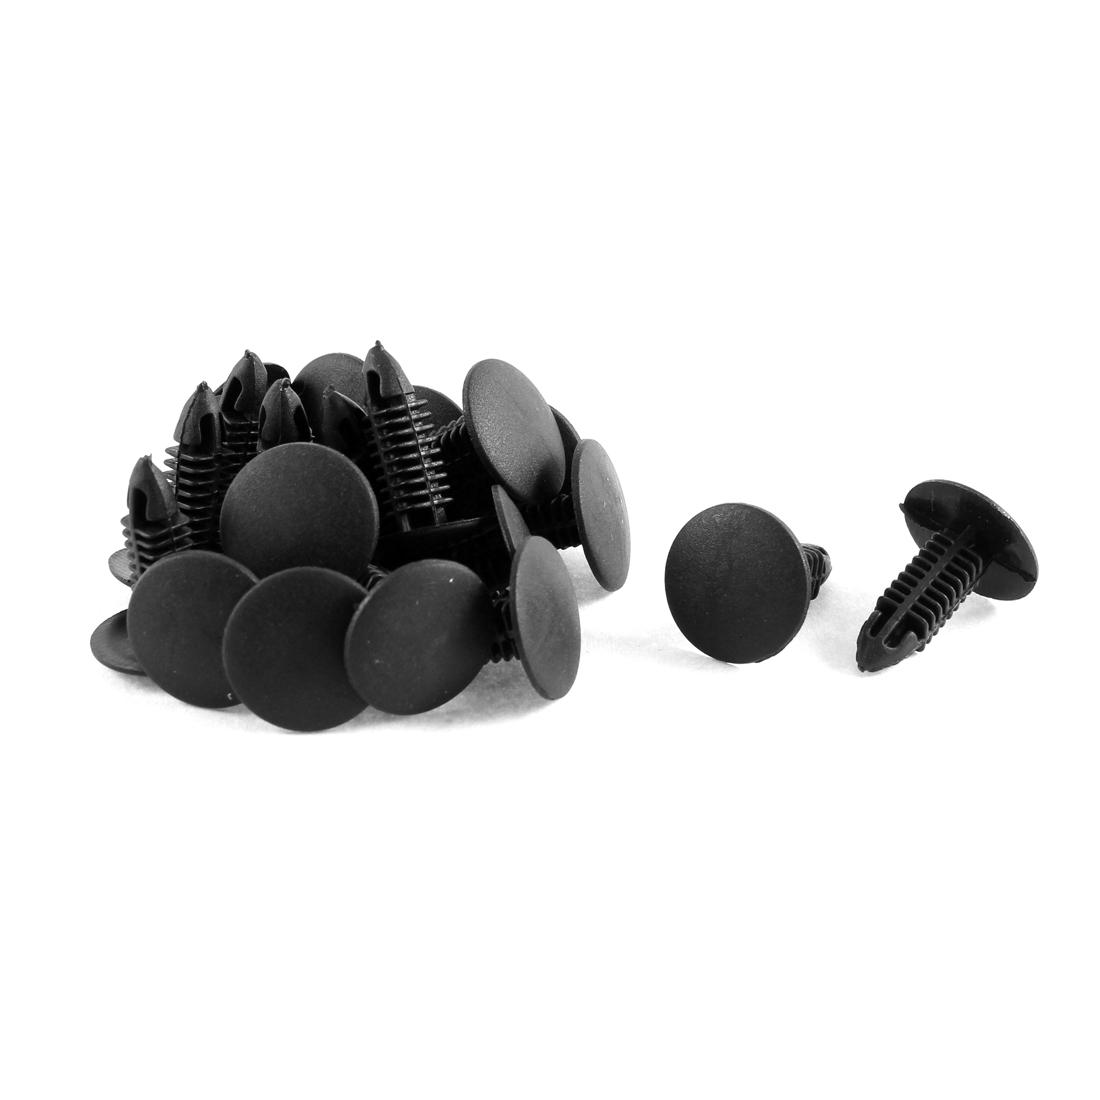 20 Pcs Black Plastic Splash Guard Moulding Bumper Clips 6mm x 17mm x 20mm